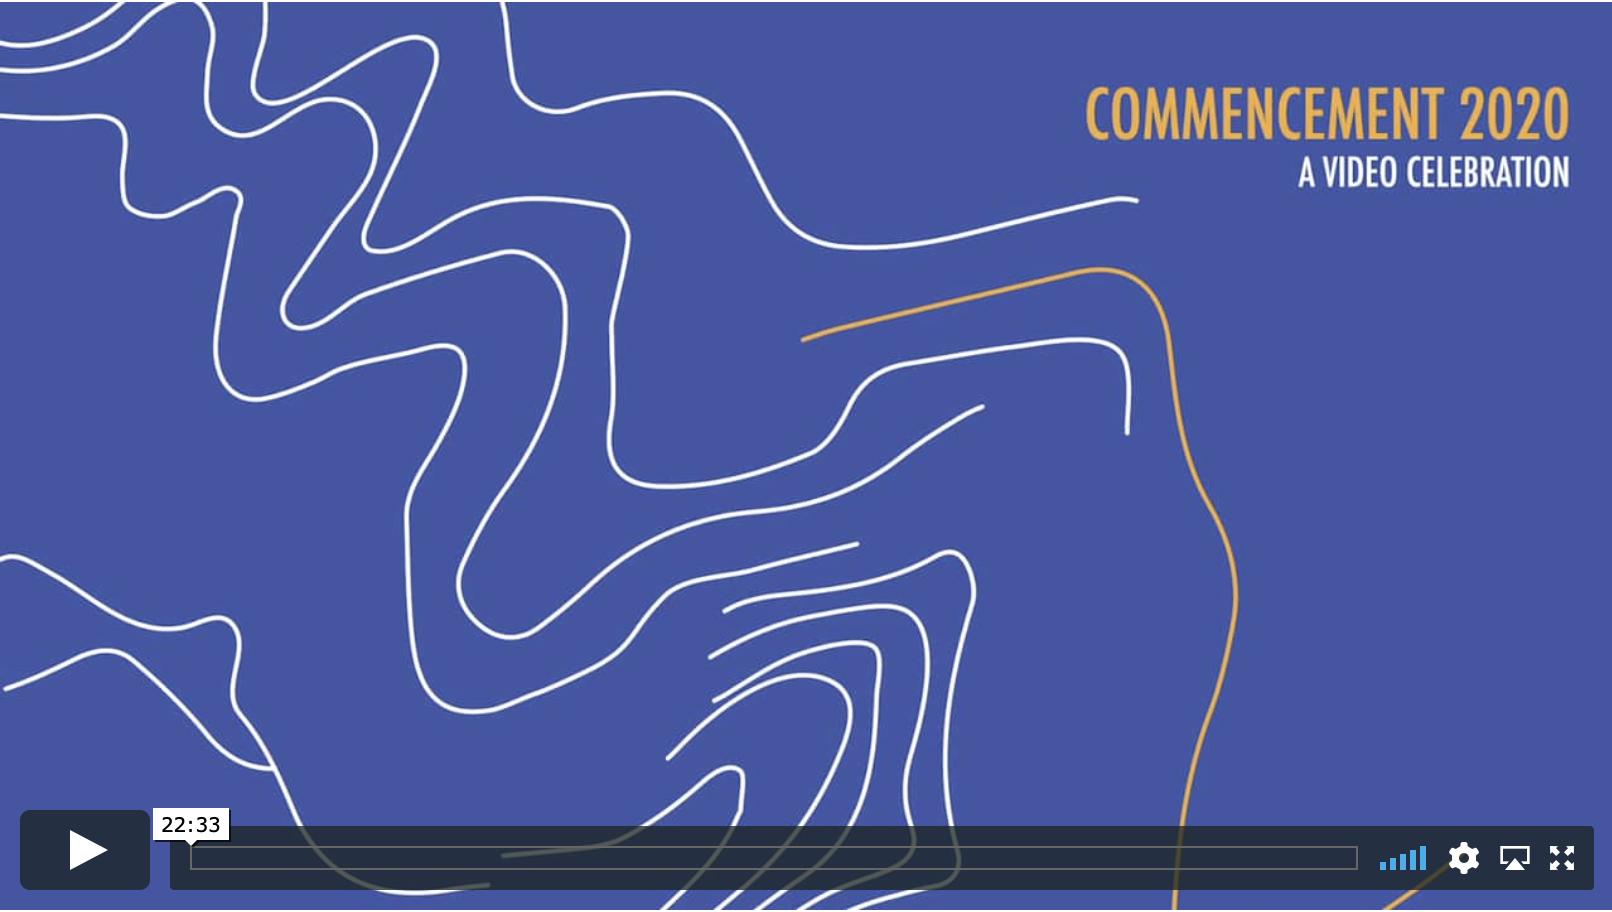 Commencement 2020 Video